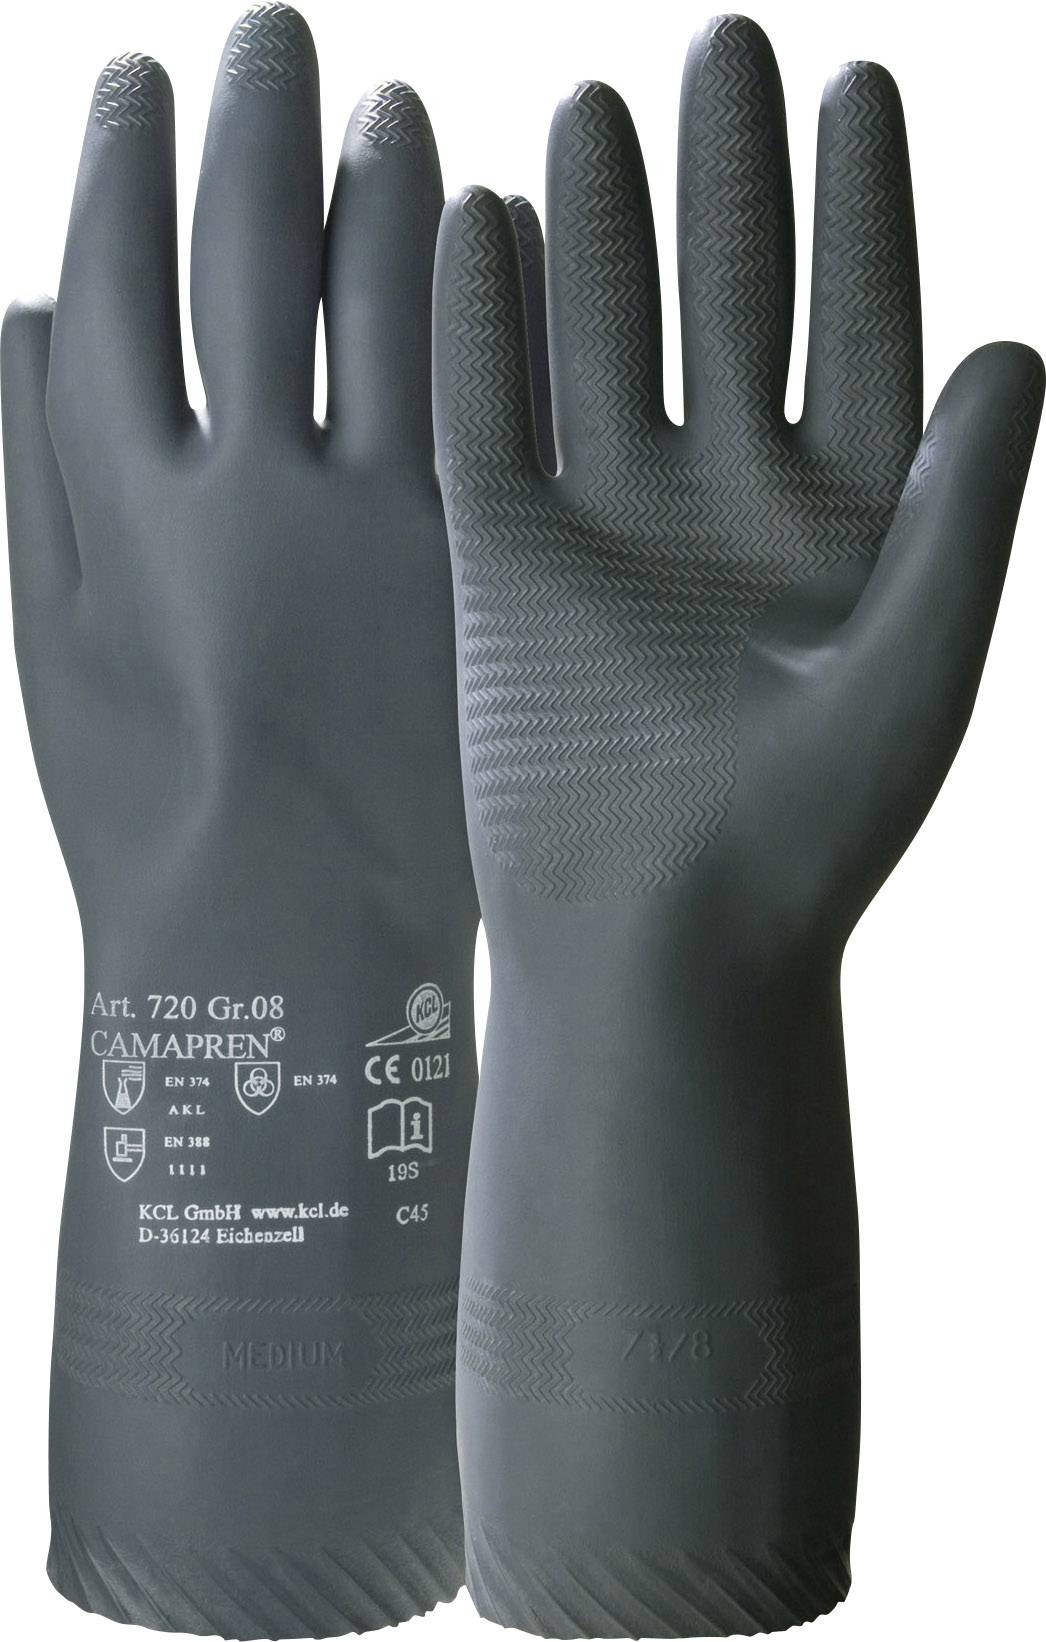 Rukavice pro manipulaci s chemikáliemi KCL Camapren® 720, Chloropren, velikost rukavic: 9, L